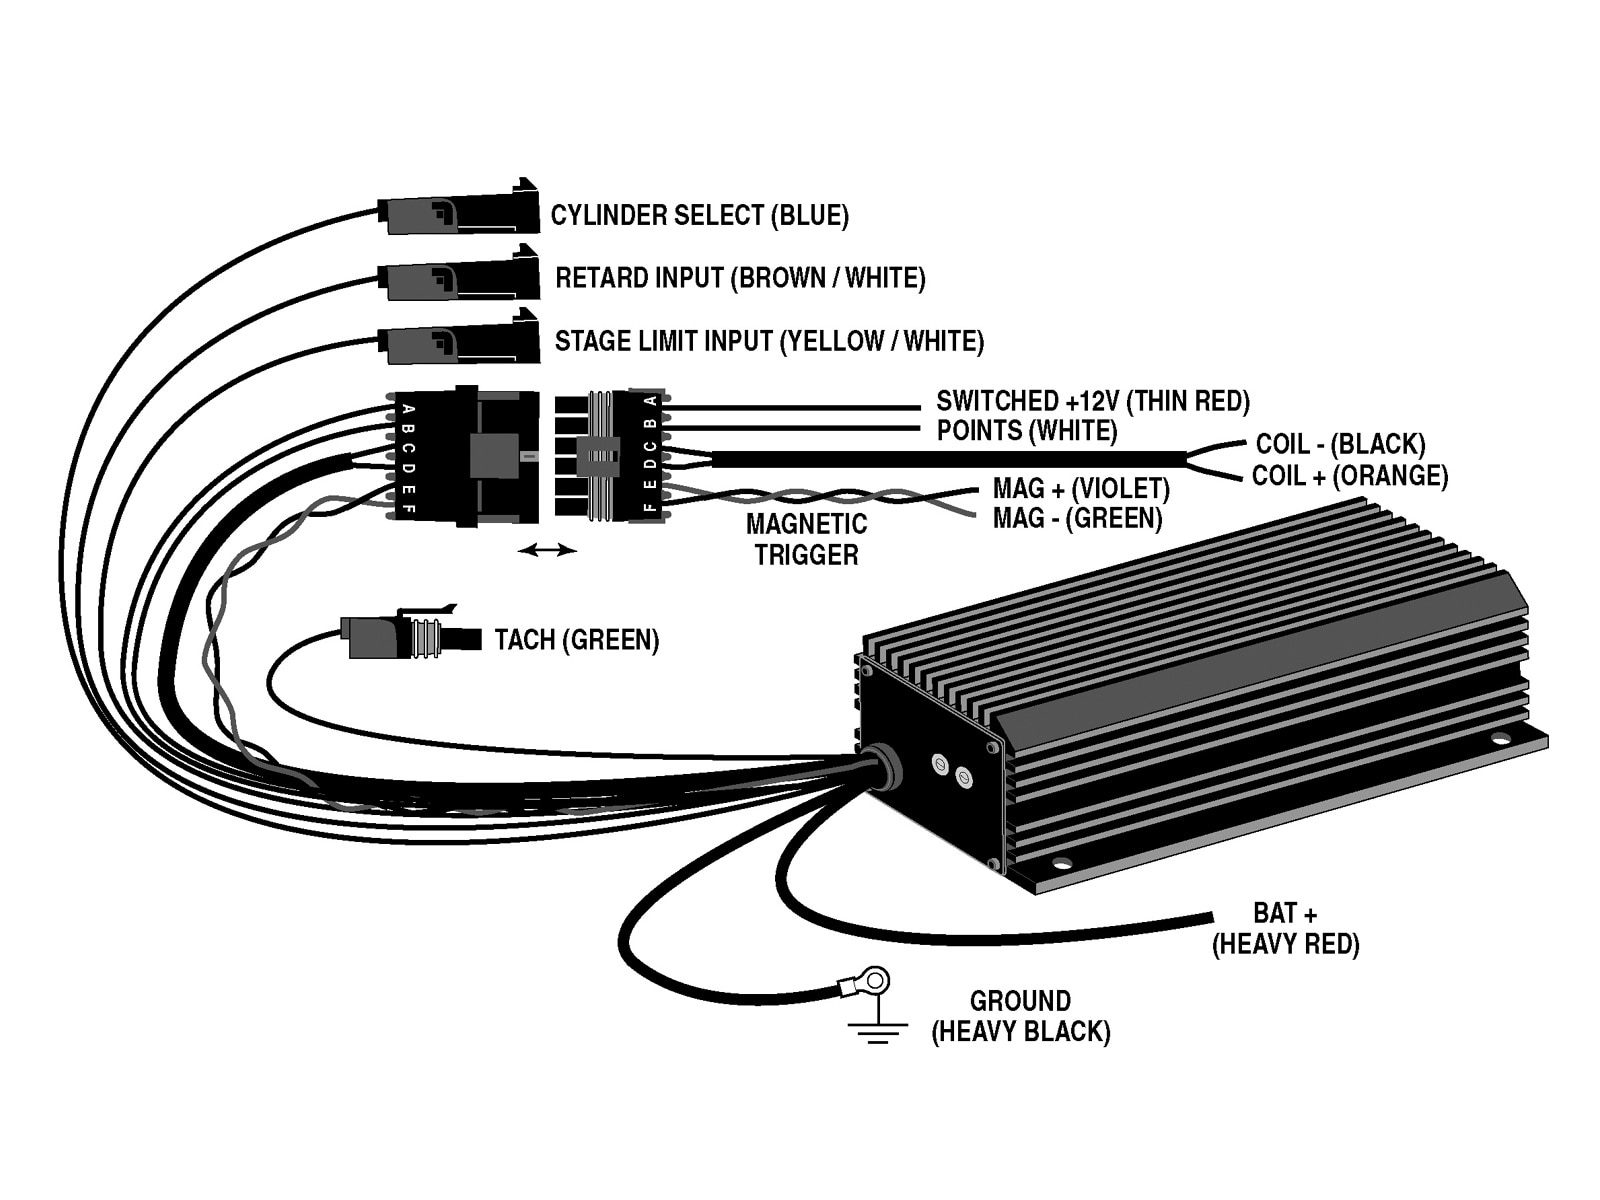 hight resolution of crane hi 6 wiring diagram wiring diagrams tar crane ignition hi 6rc wiring diagram crane